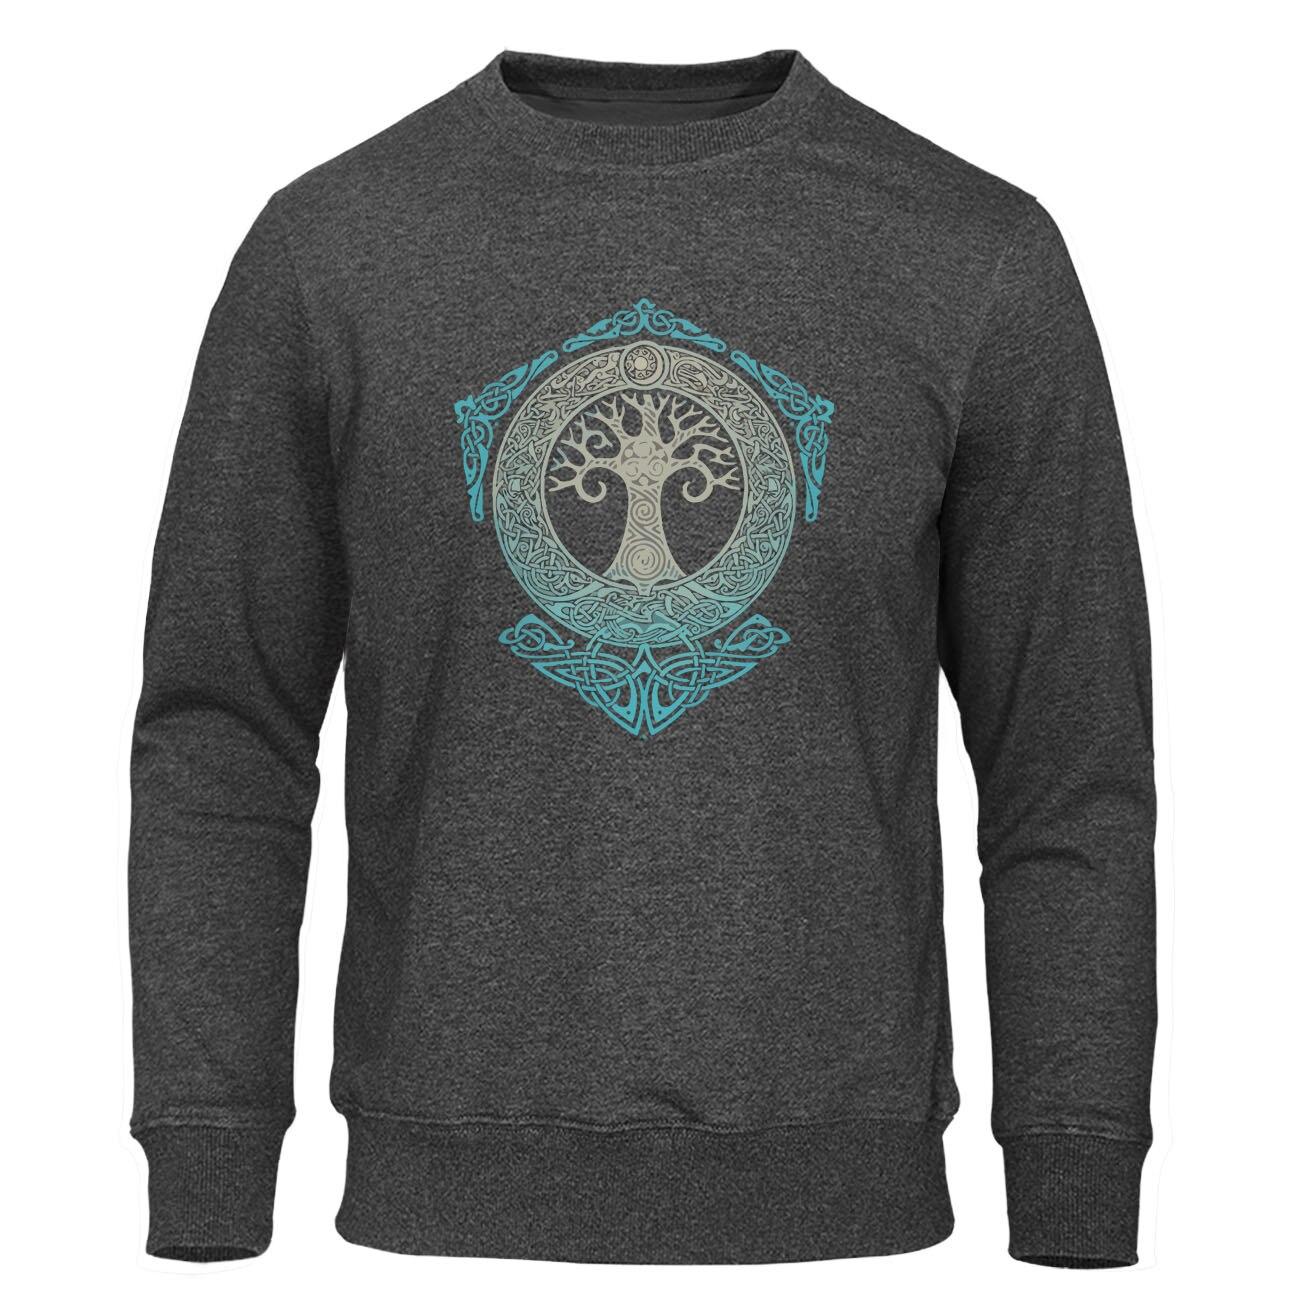 Yggdrasil Pullover World Tree Men Warm Streetwear 2019 Winter Autumn Fleece Hoodies Odin Aesir Nordic Mythology Men's Sweatshirt